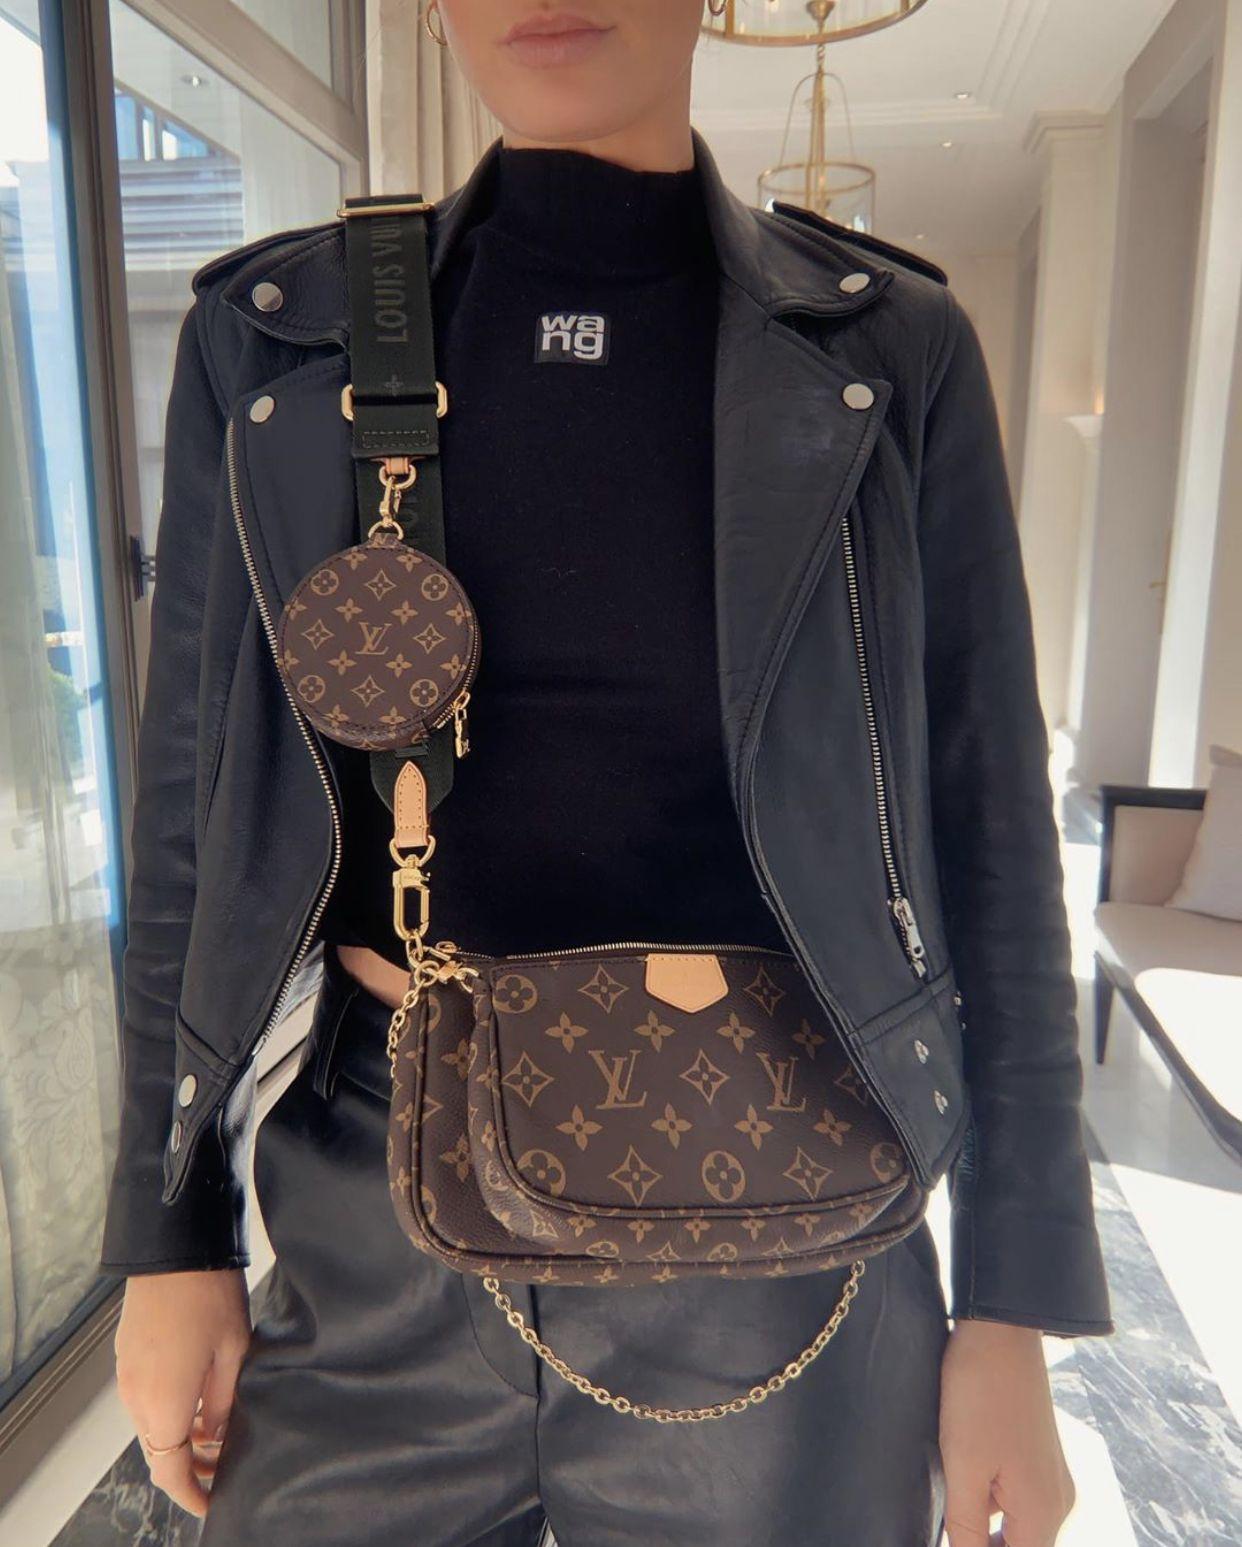 Pin By Fatima On Style Inspo Louis Vuitton Louis Vuitton Bag Fashion Bags